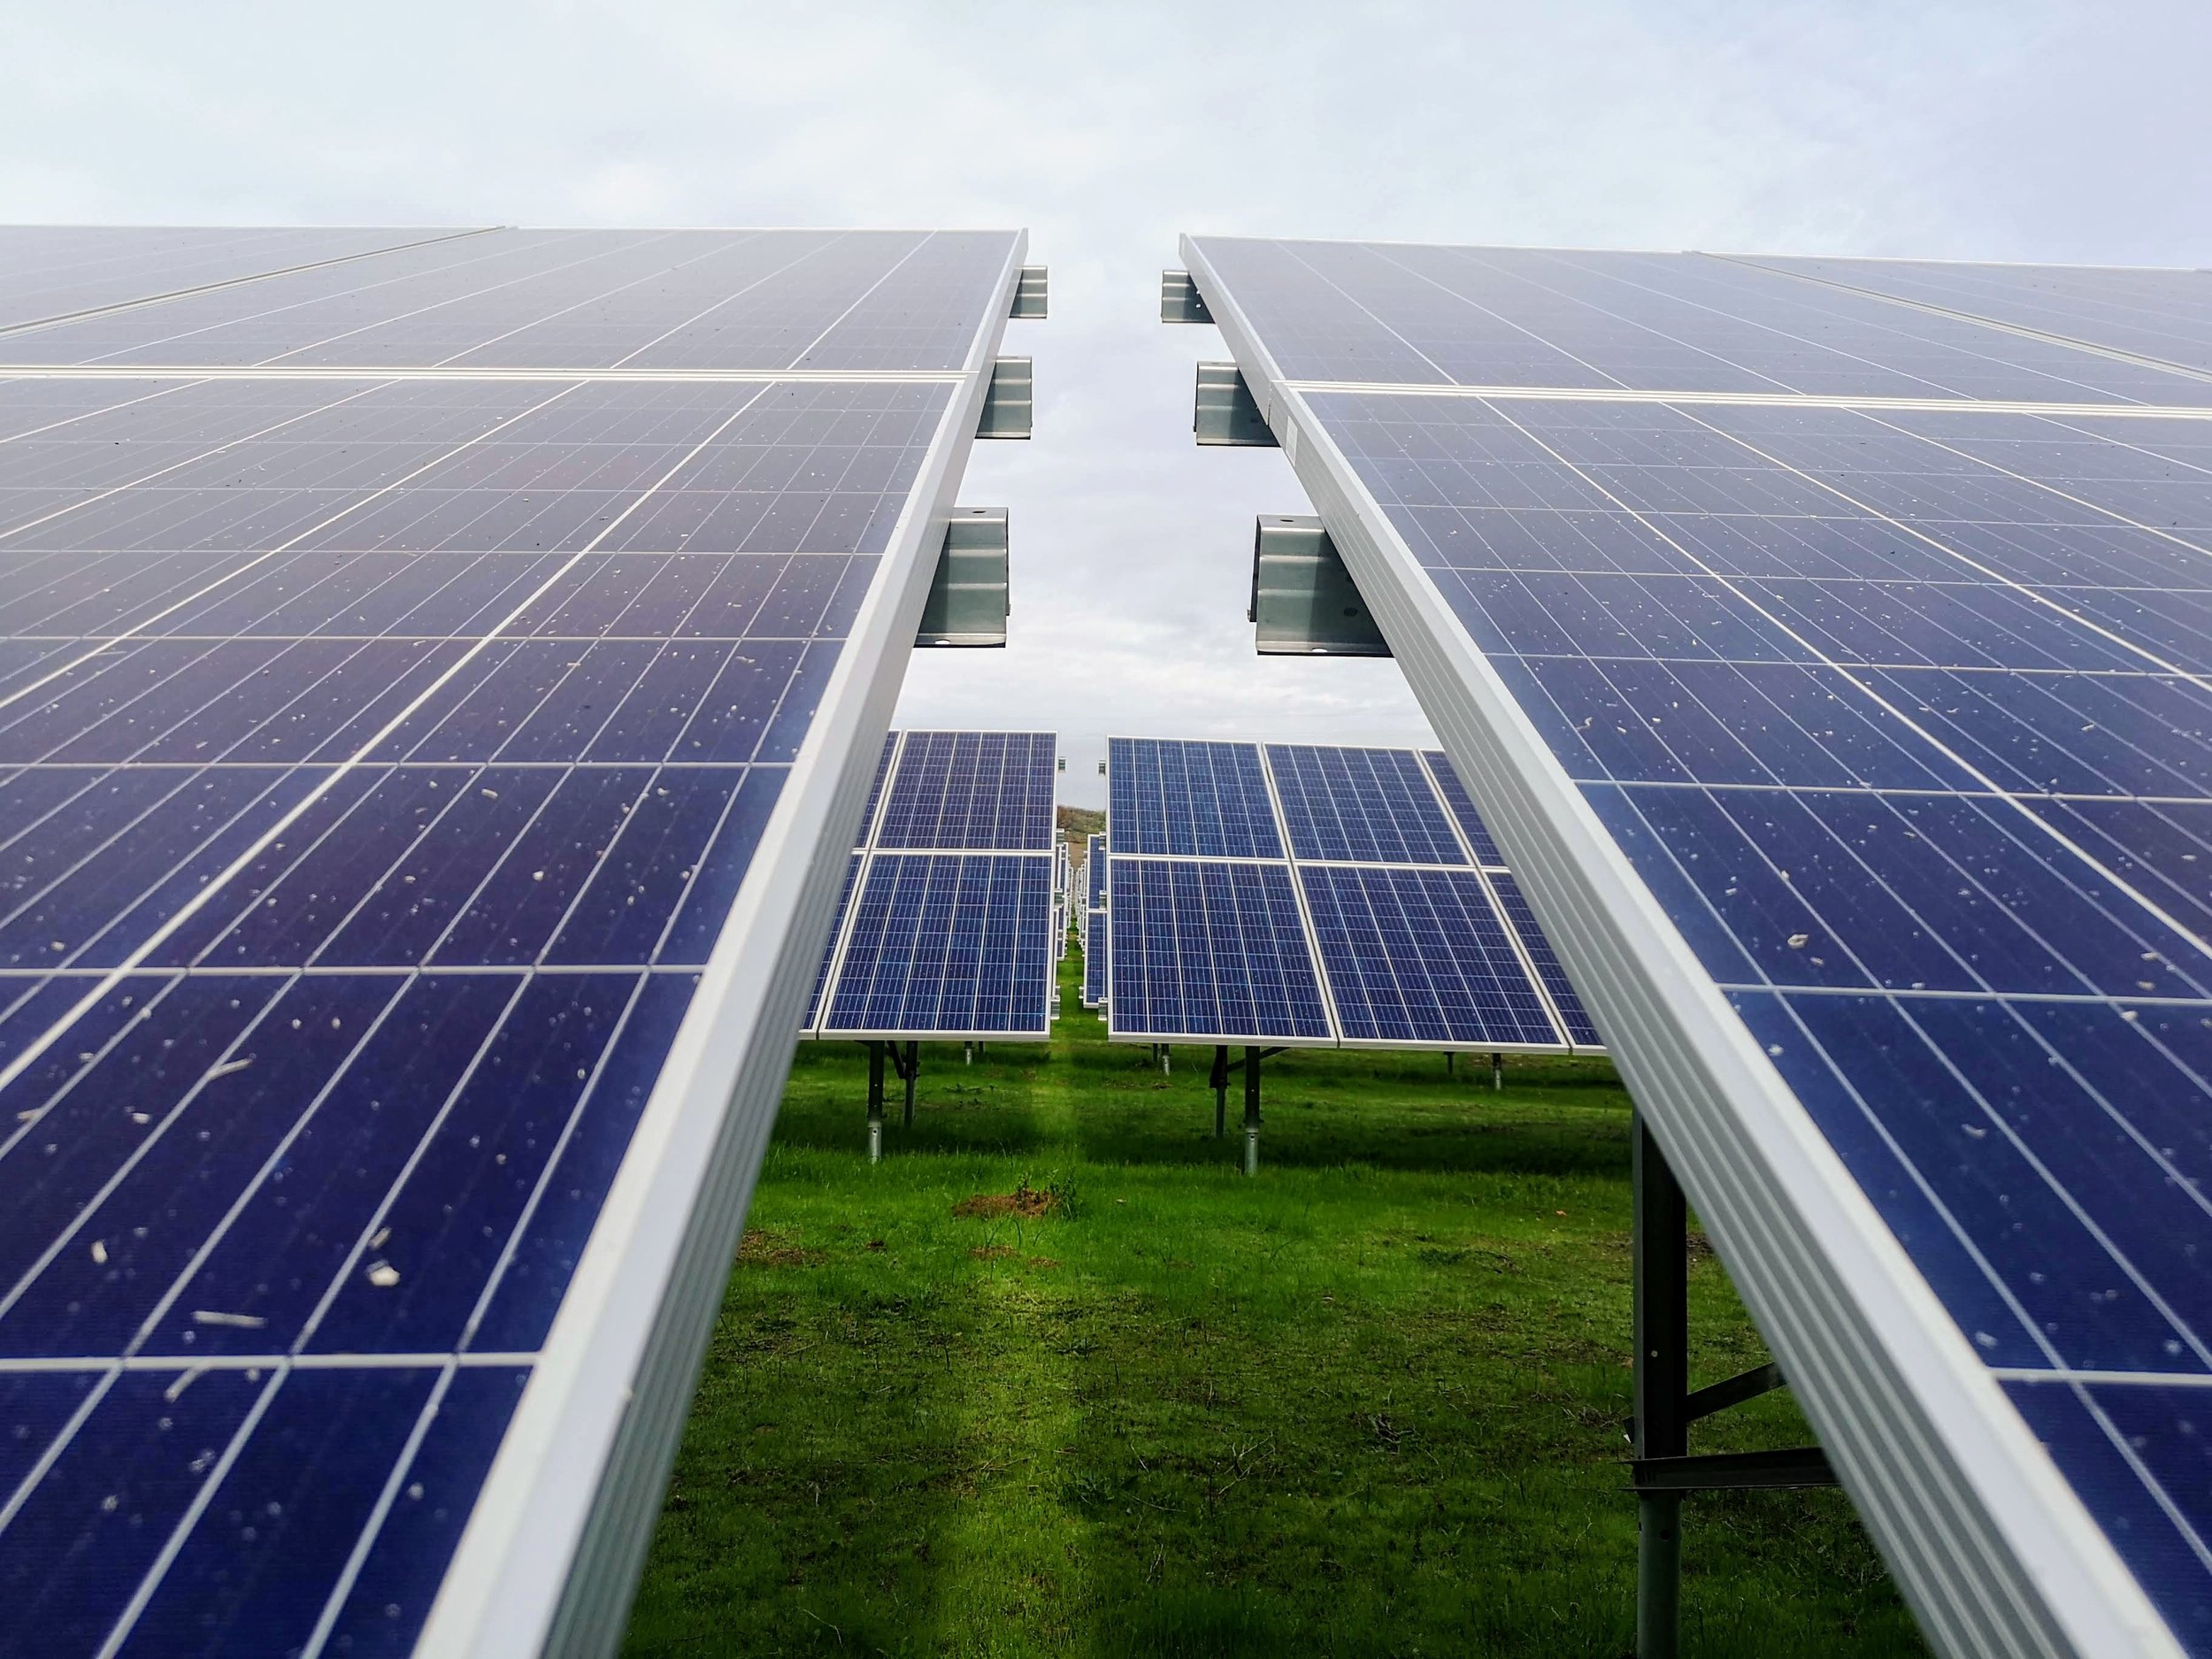 solar-power-prevents-climate-change.jpg